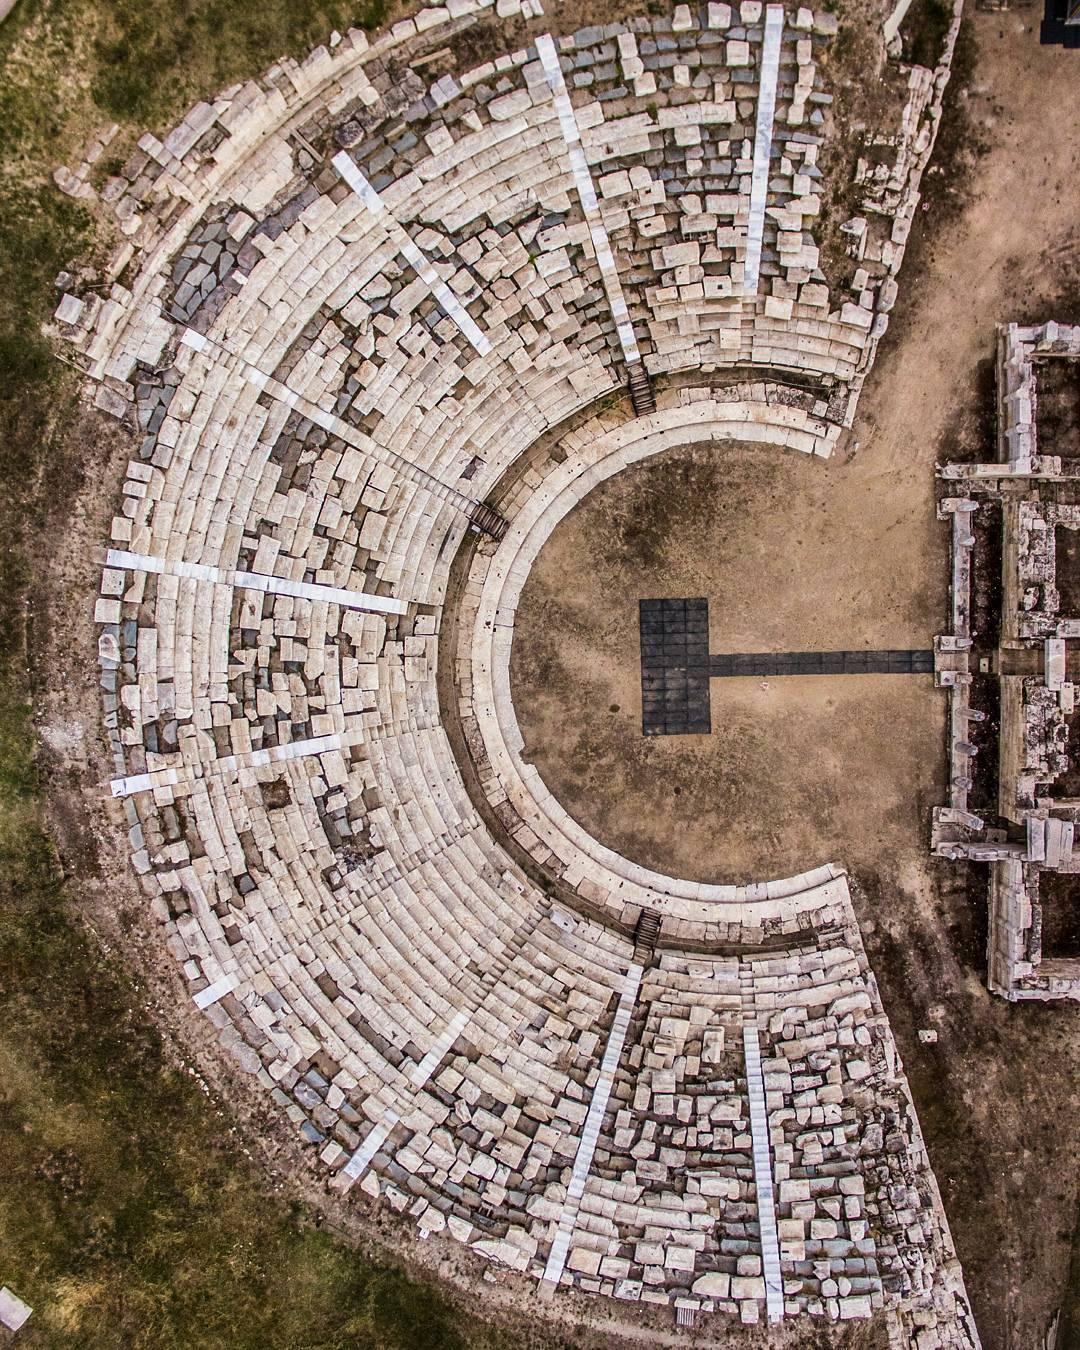 18580112 299427263814076 2137471877369561088 n - Οι εντυπωσιακές φωτογραφίες από την Λάρισα και τα παράλια της από «ψηλά»